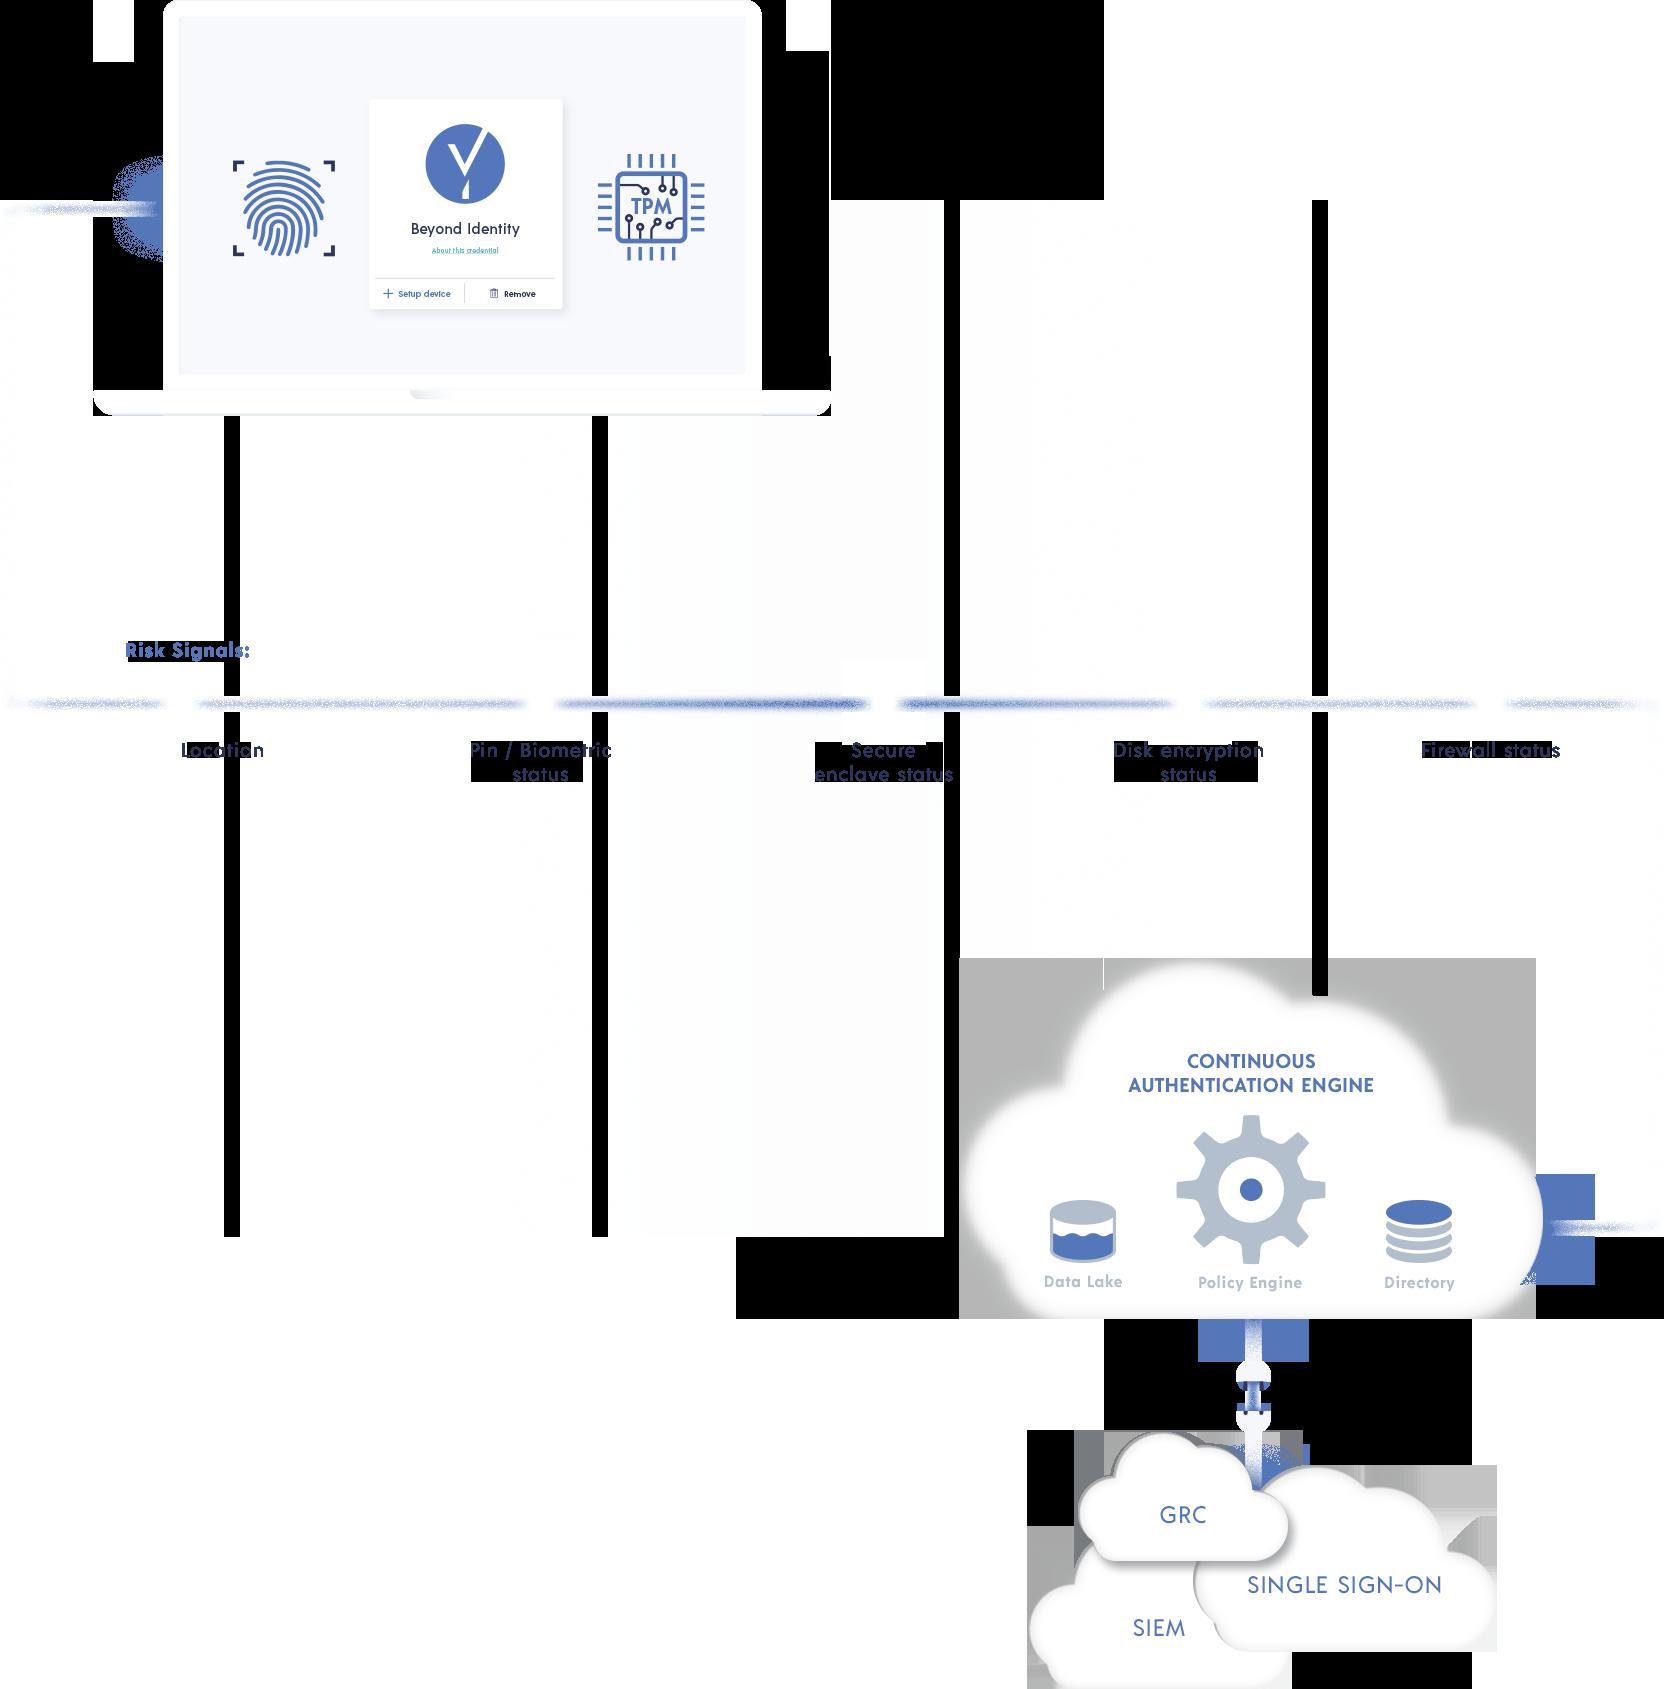 BI Cloud diagram explanation